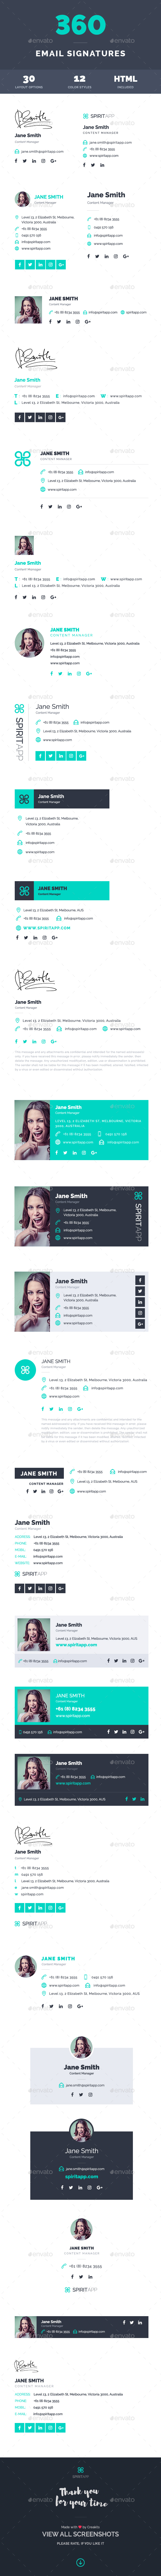 360 Professional E-Signature Templates - Miscellaneous Social Media